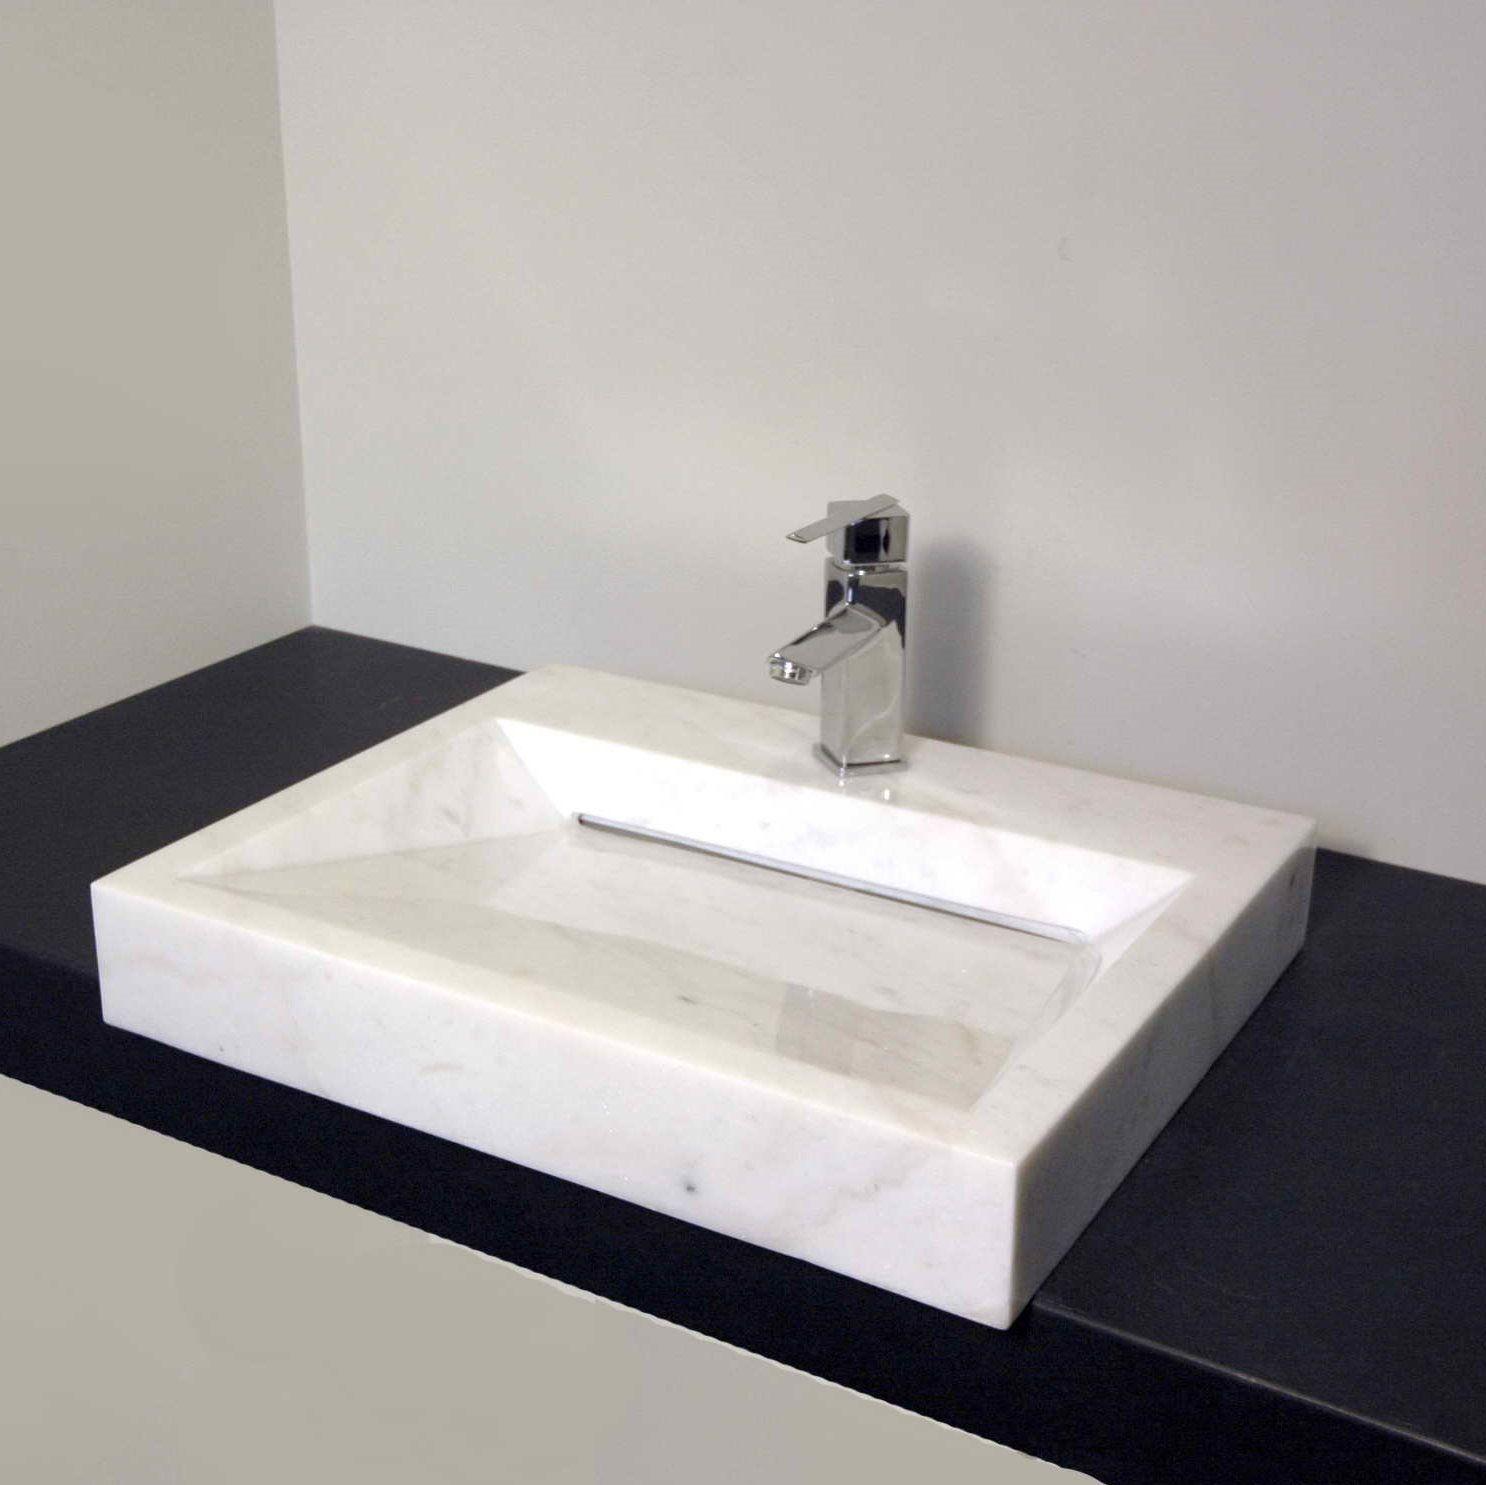 Non Concrete Ramp Sink Bathrooms Forum Gardenweb Square Bathroom Sink Small Bathroom Sinks Luxury Bathroom Sinks